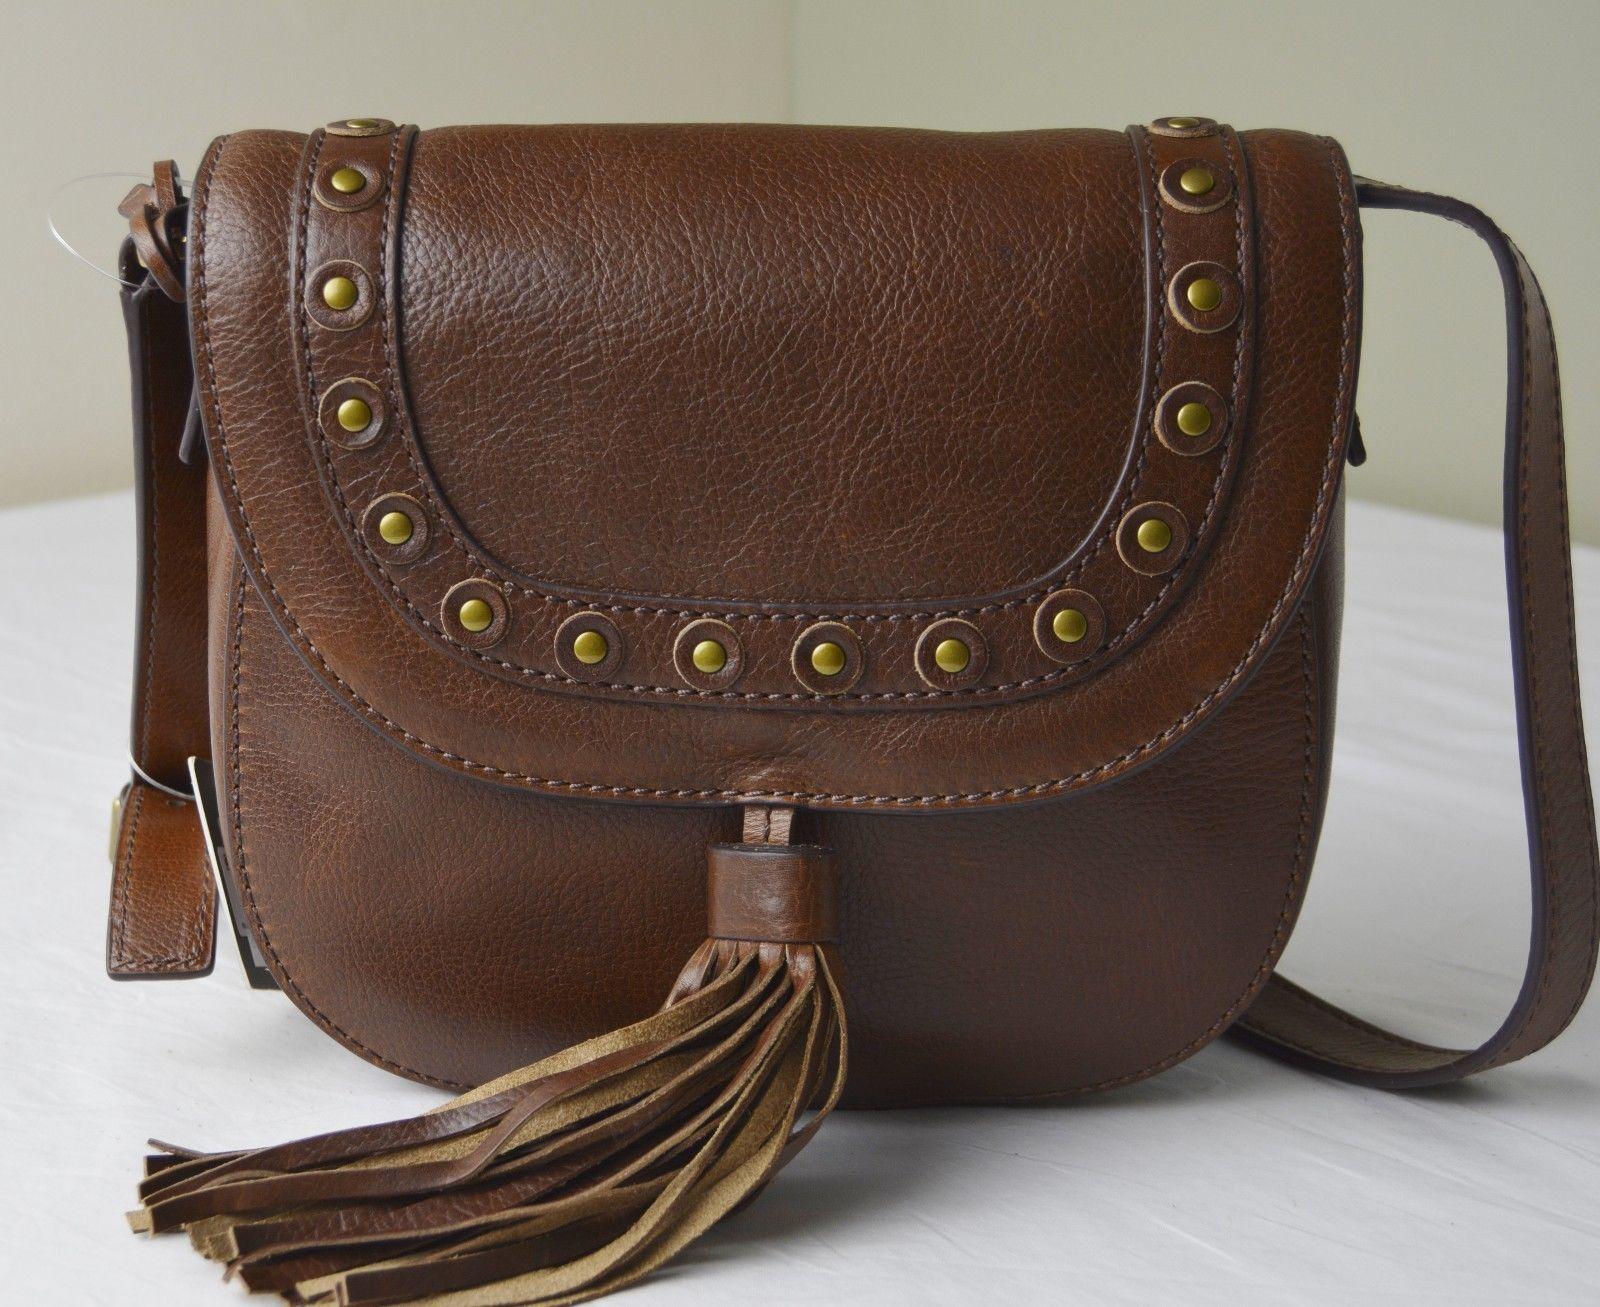 Fossil Emi Brown Leather Tassel Studded Saddle Crossbody Messenger Bag